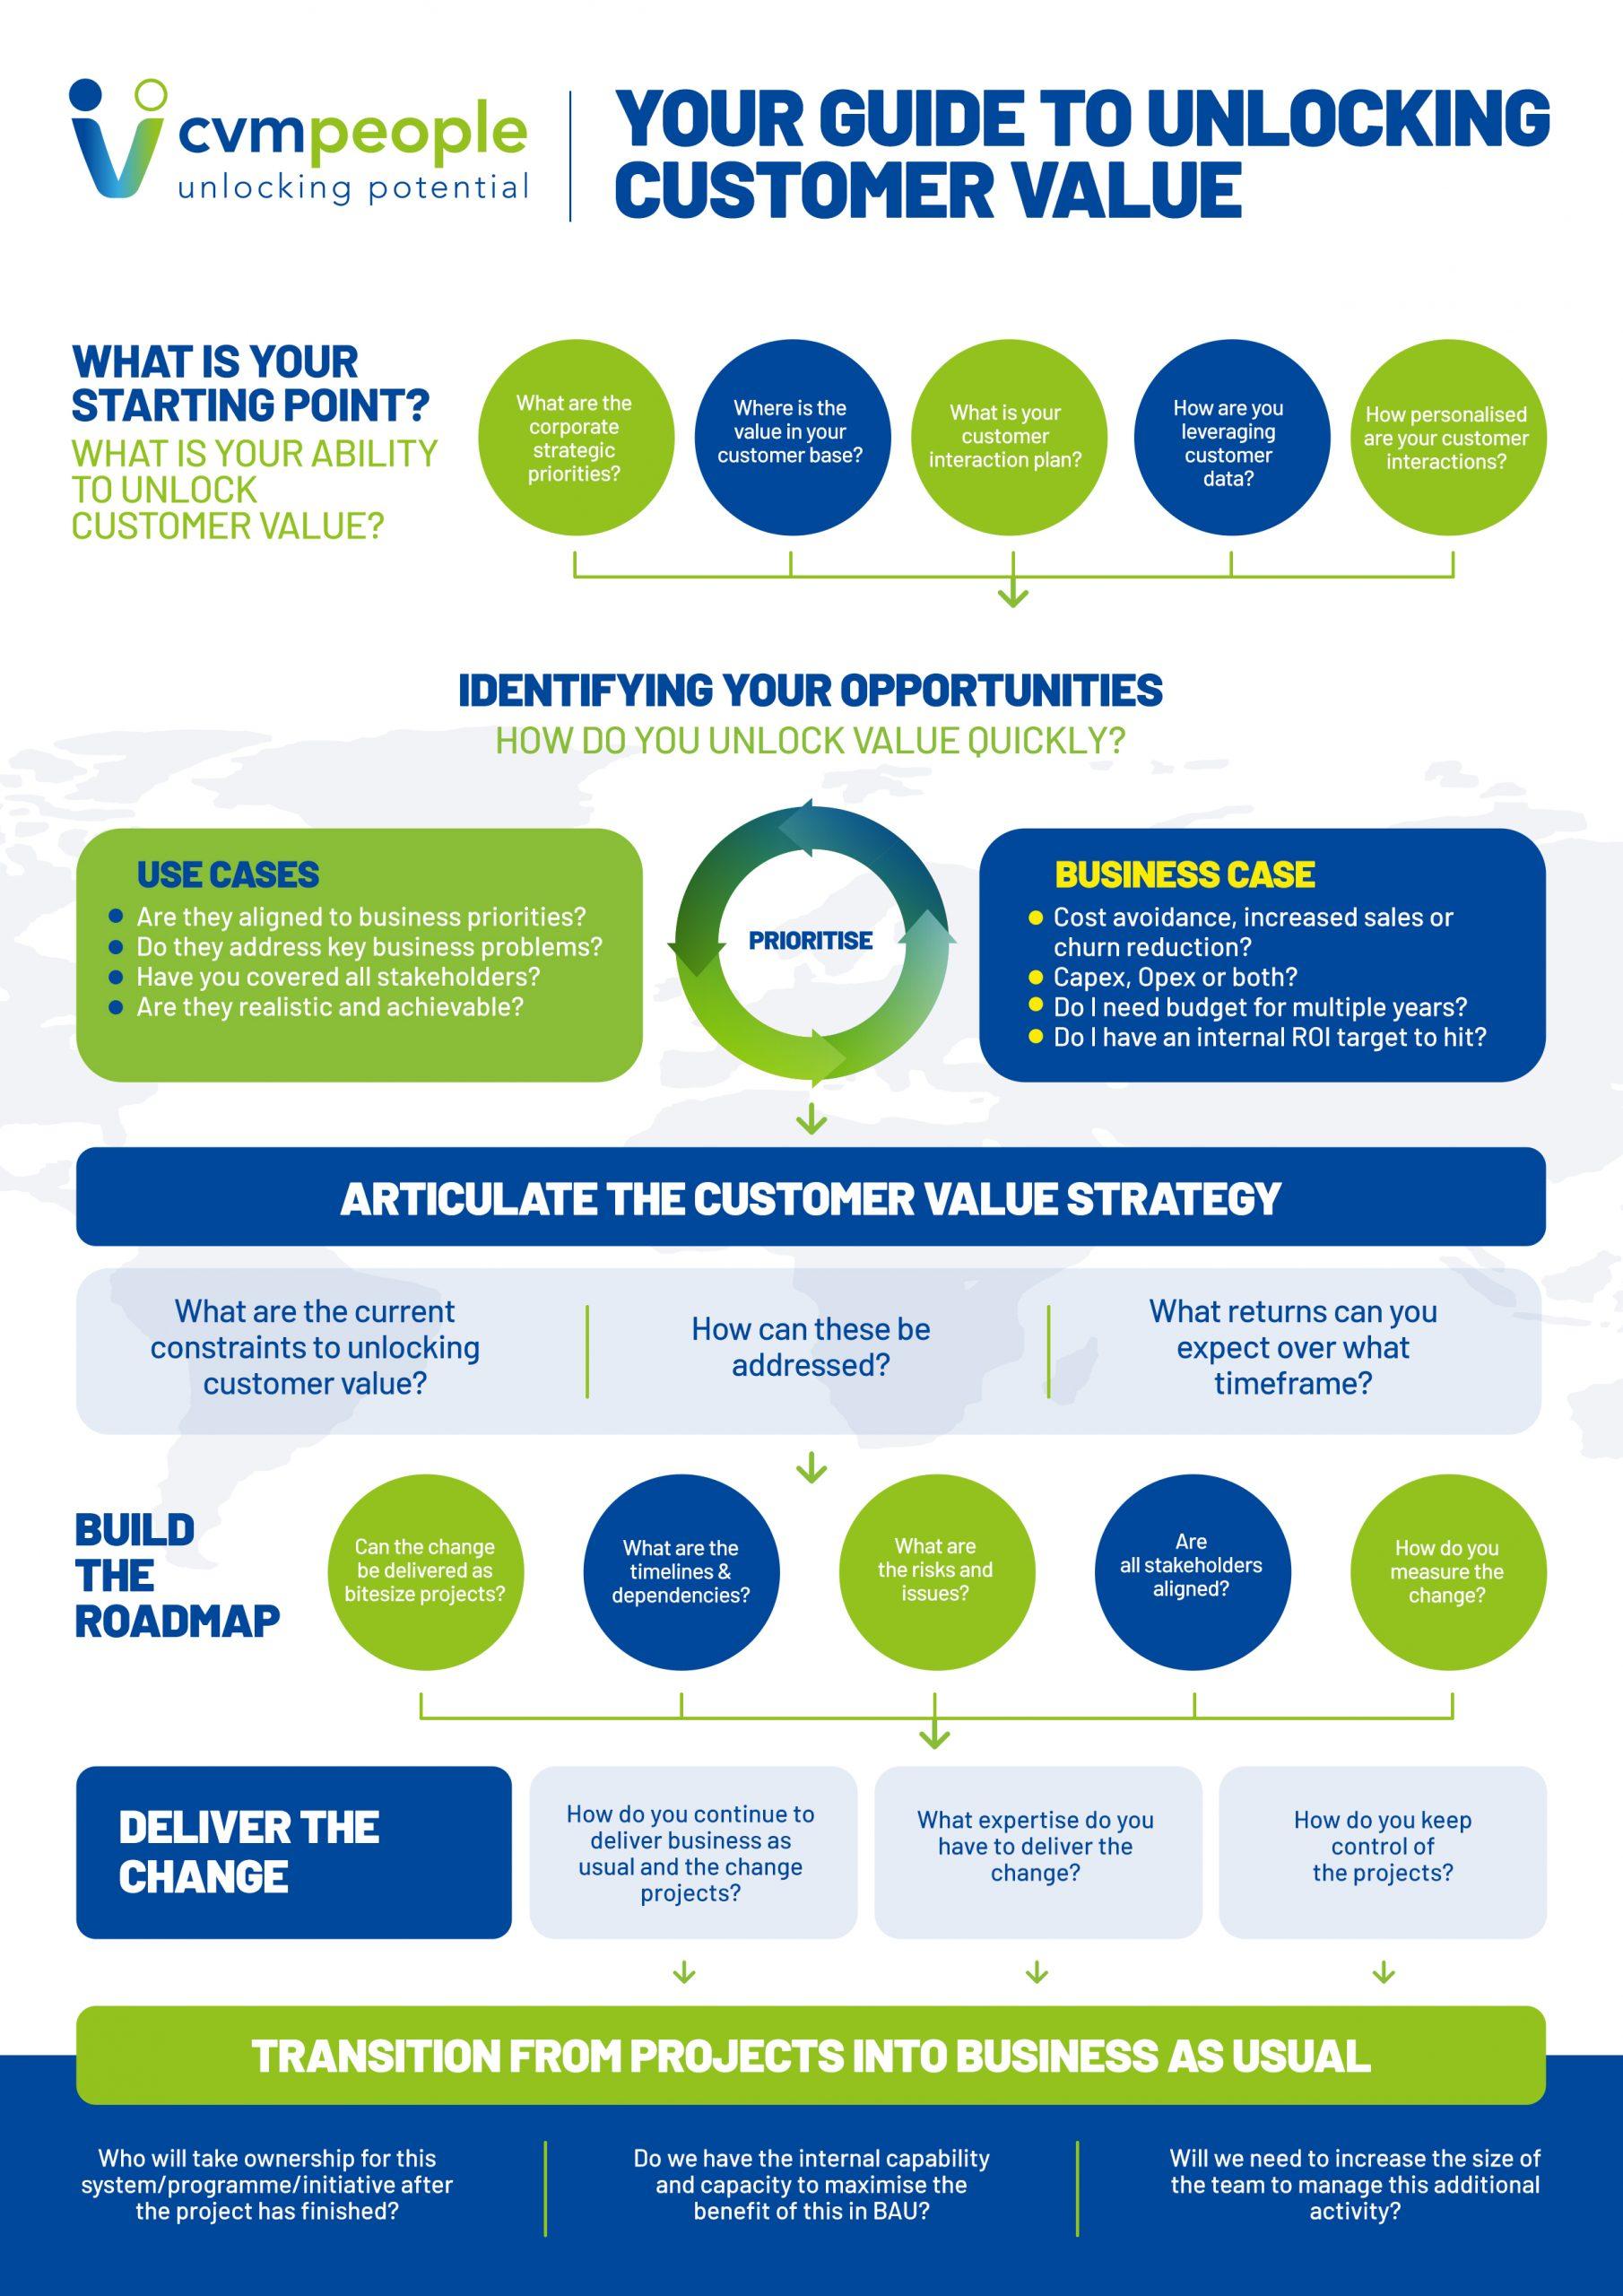 Unlocking Customer Value Framework Infographic